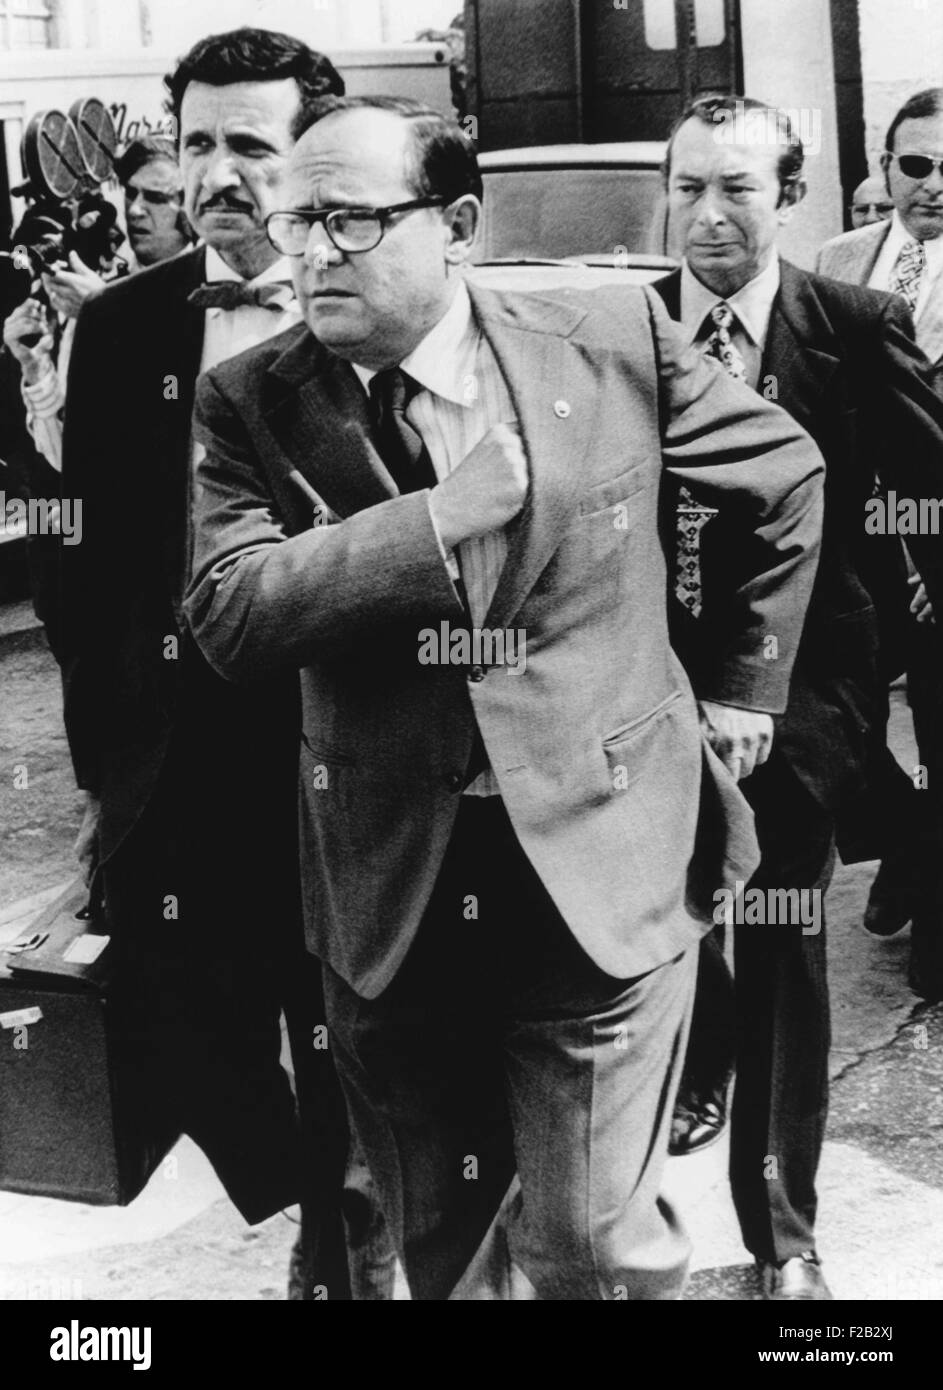 Watergate Burglars, Bernard Barker, (left) and Eugenio Martinez (right), outside US District Court. June 26, 1974. - Stock Image